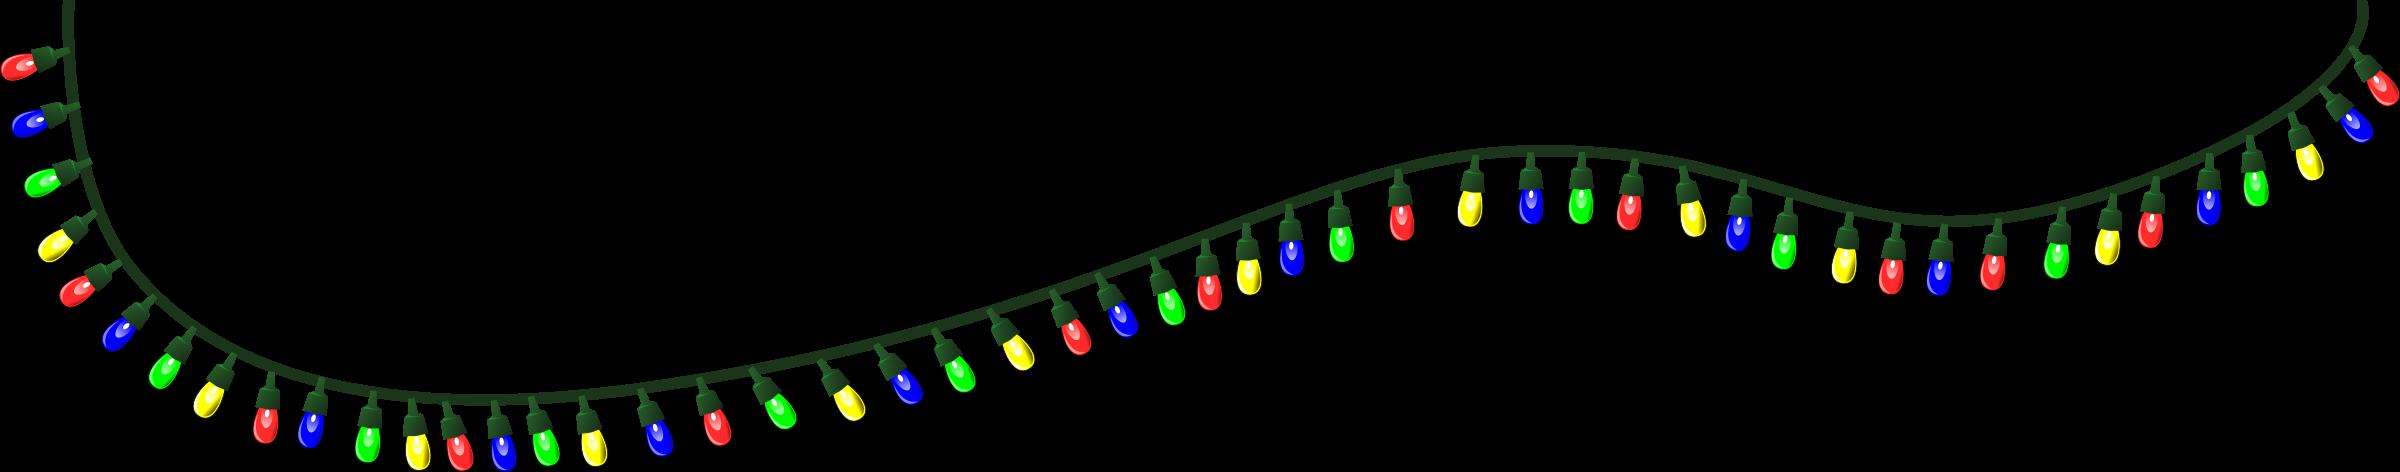 Stranger Things Christmas Lights Png.Lights Clipart Stranger Thing Lights Stranger Thing